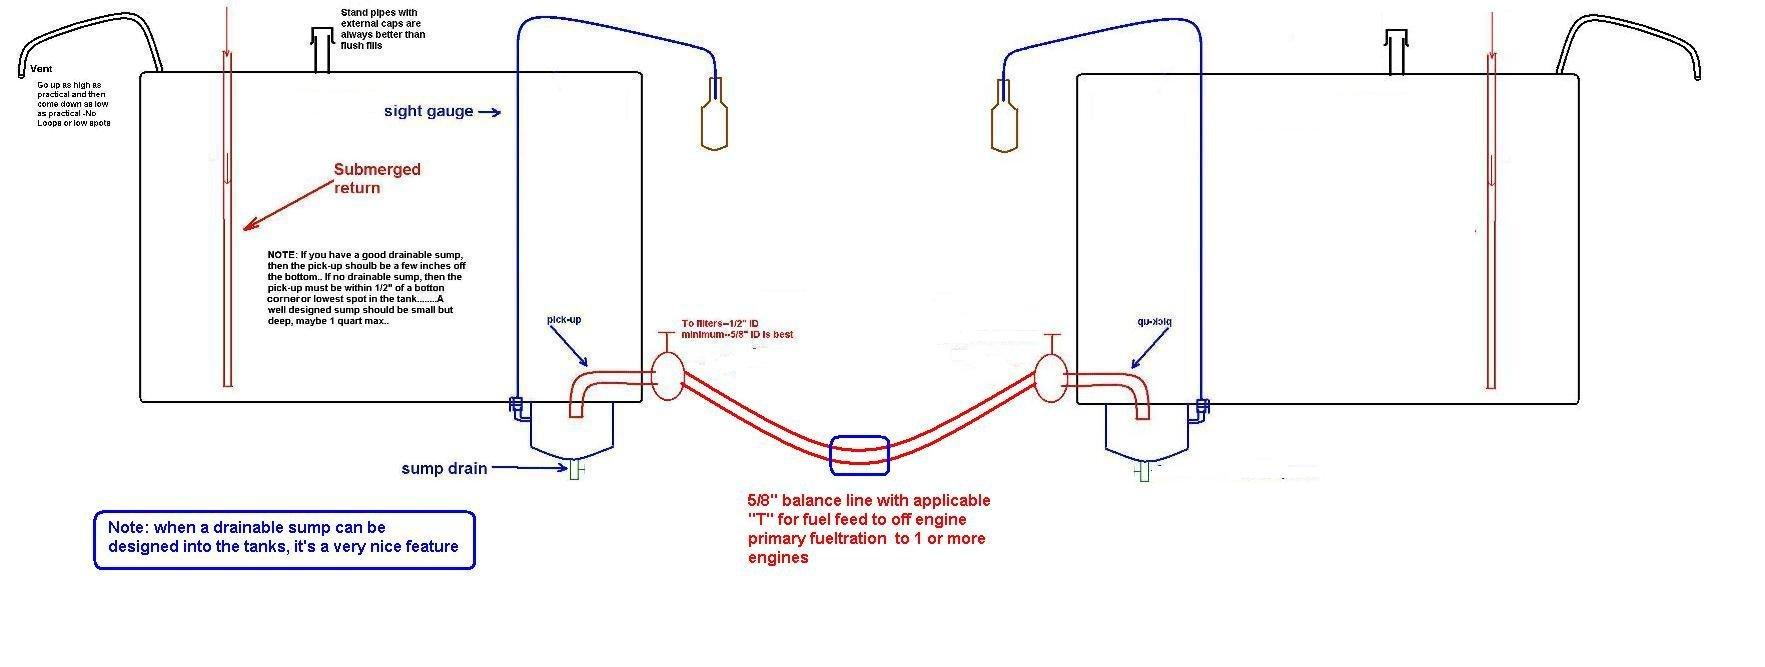 2008 Kawasaki Teryx Wiring Diagram Trusted Case 1845c U2022 For Free